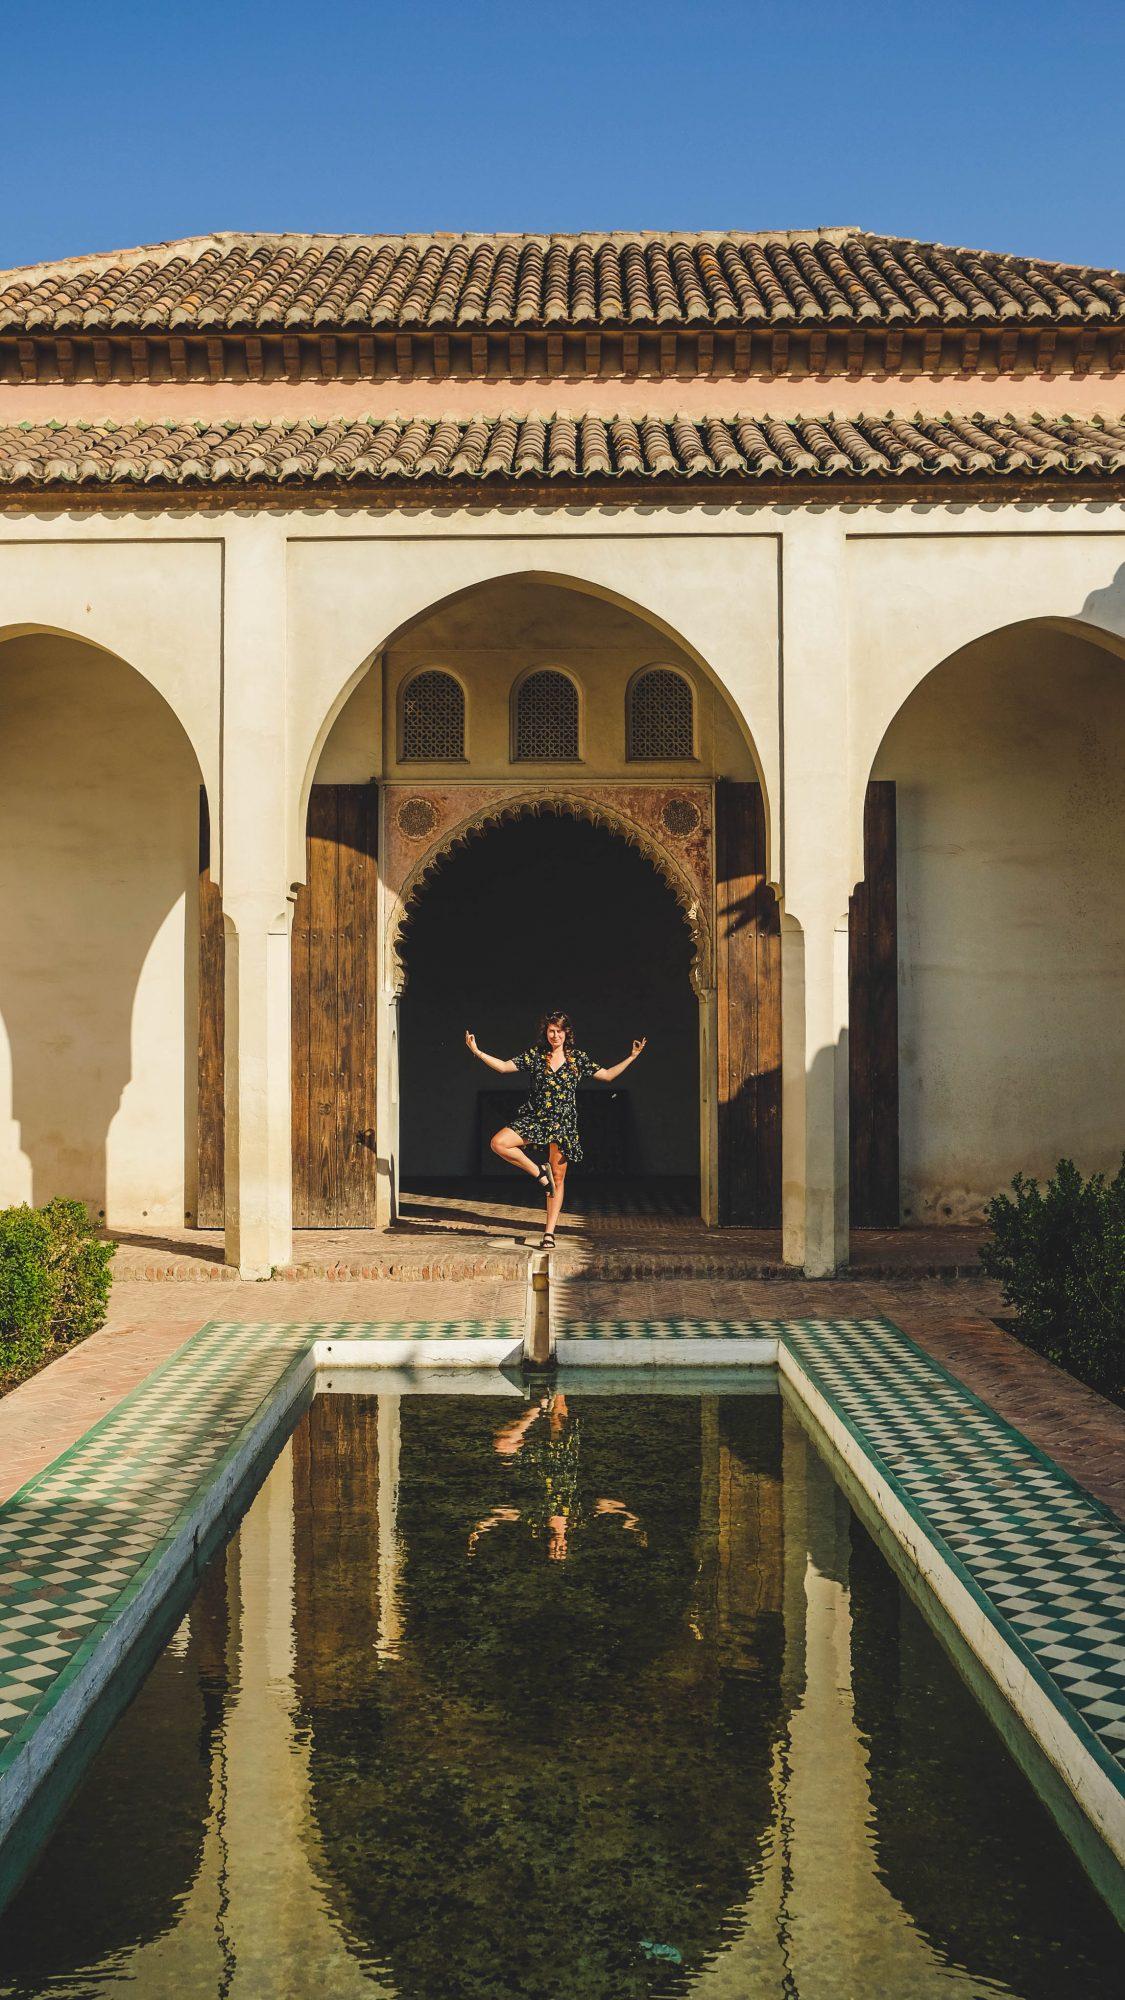 Patio intérieur - Malaga, Espagne